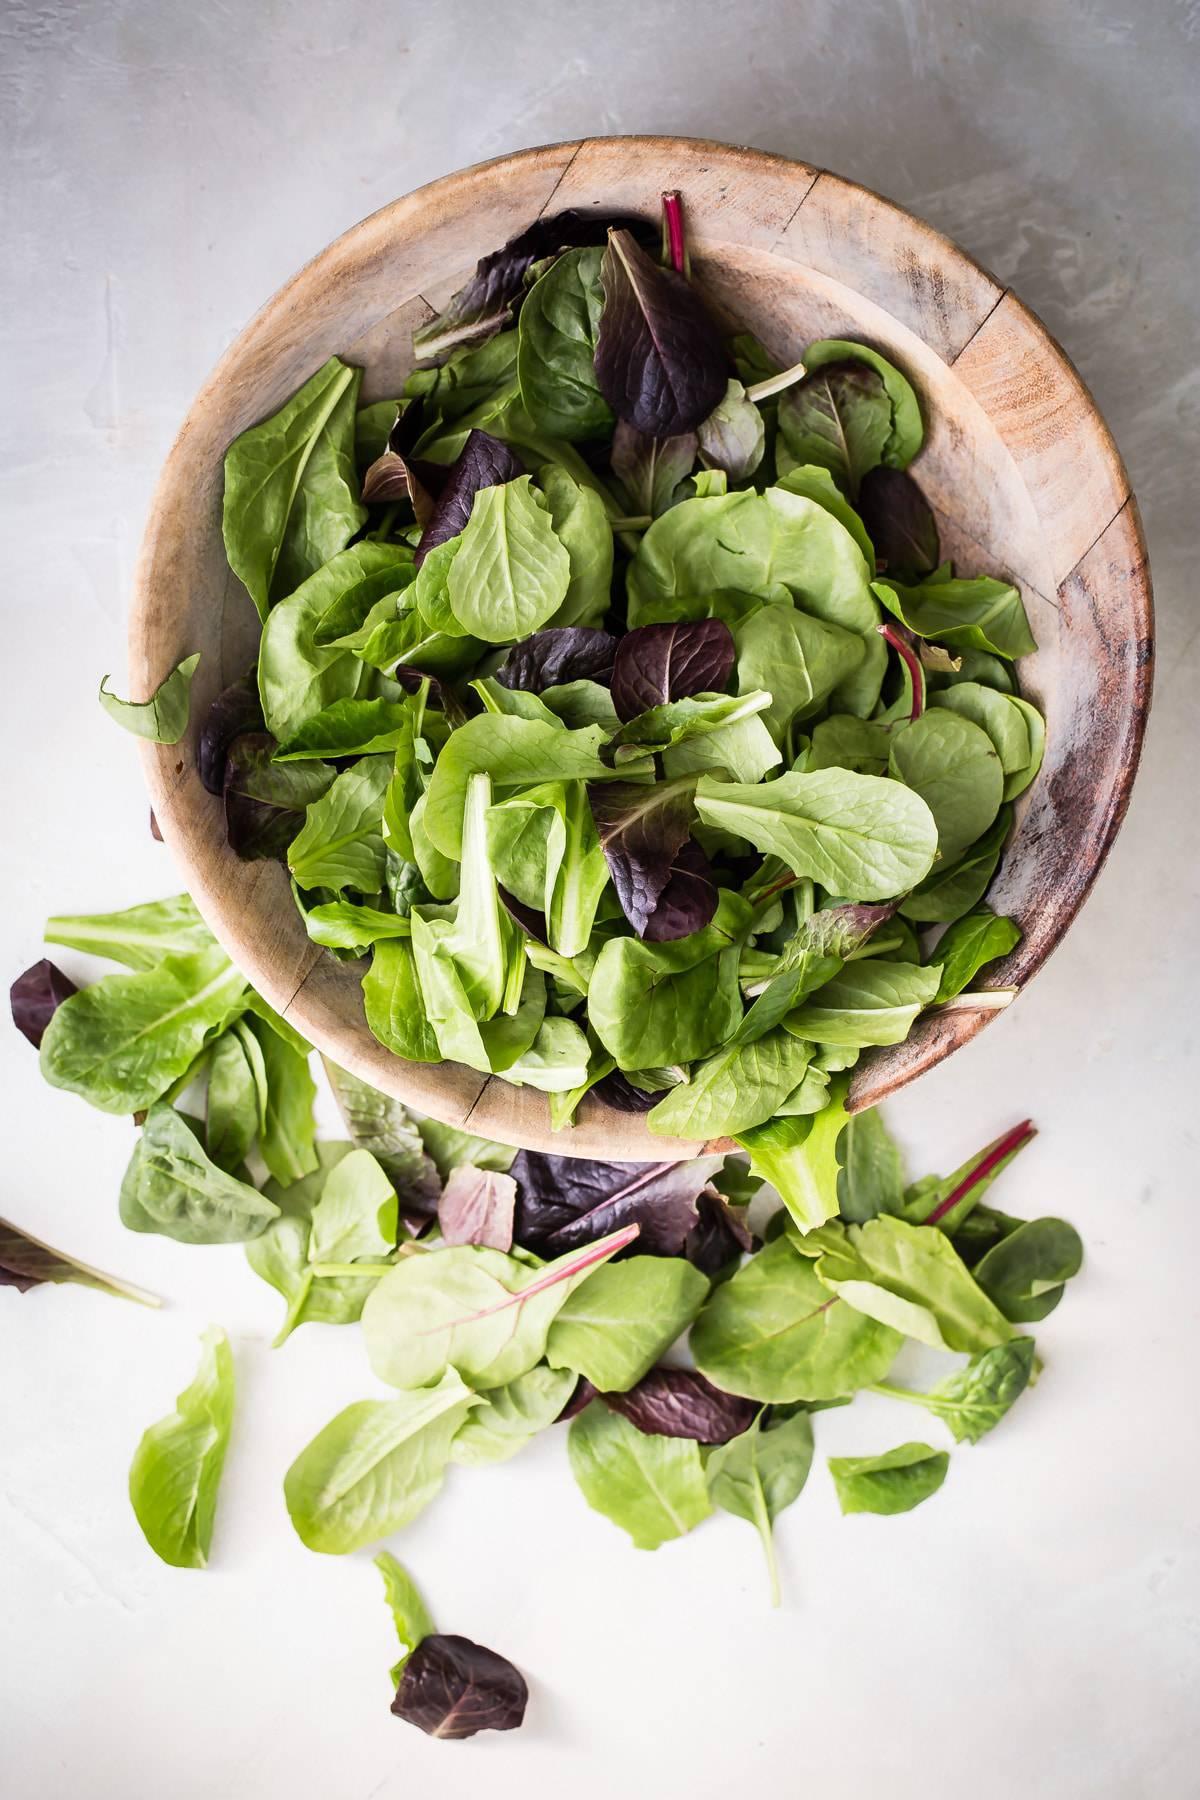 Spring mix salad greens